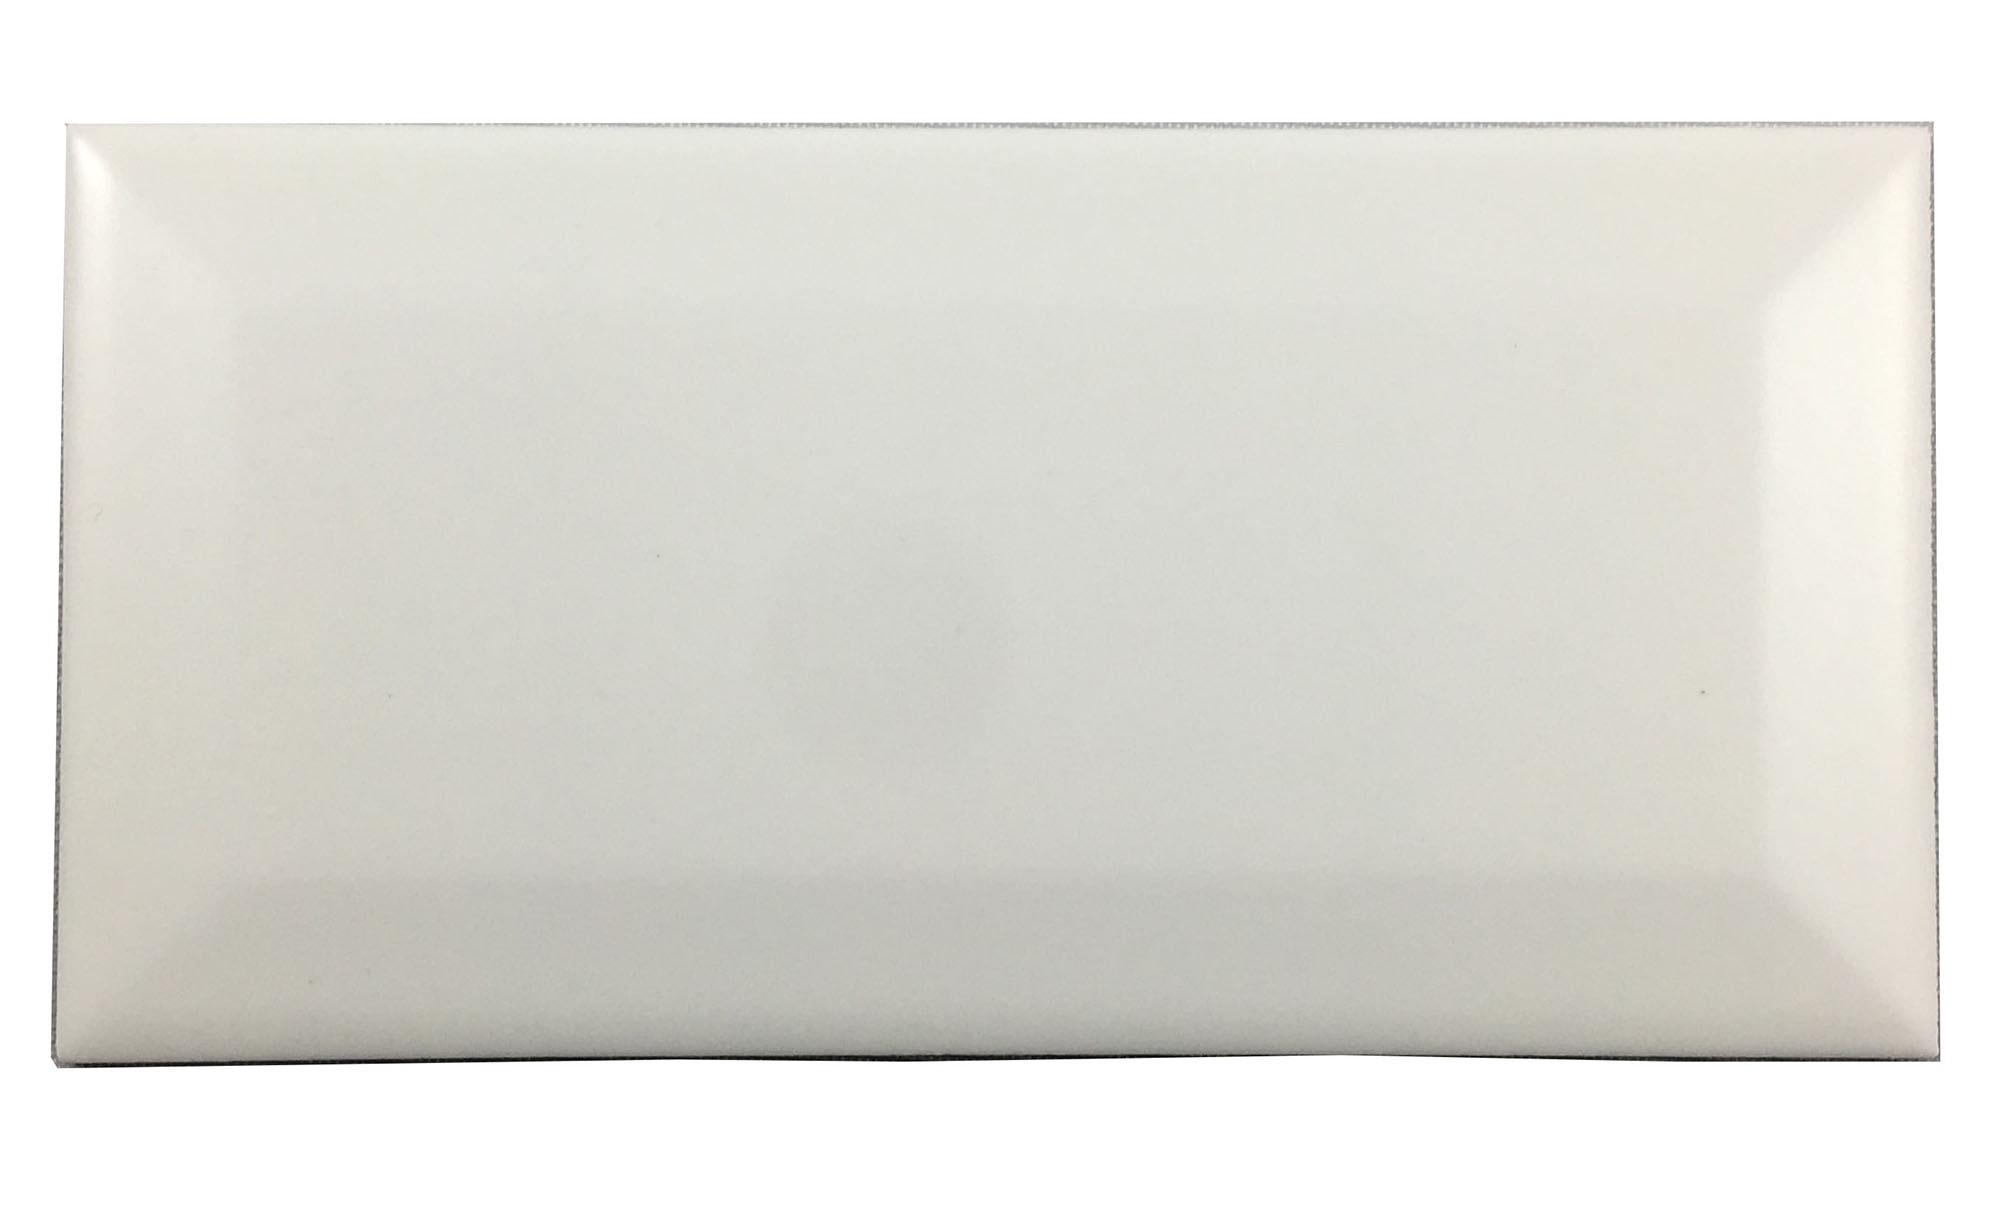 "White Beveled / 3""x6"" / Matt Subway Tile 0"